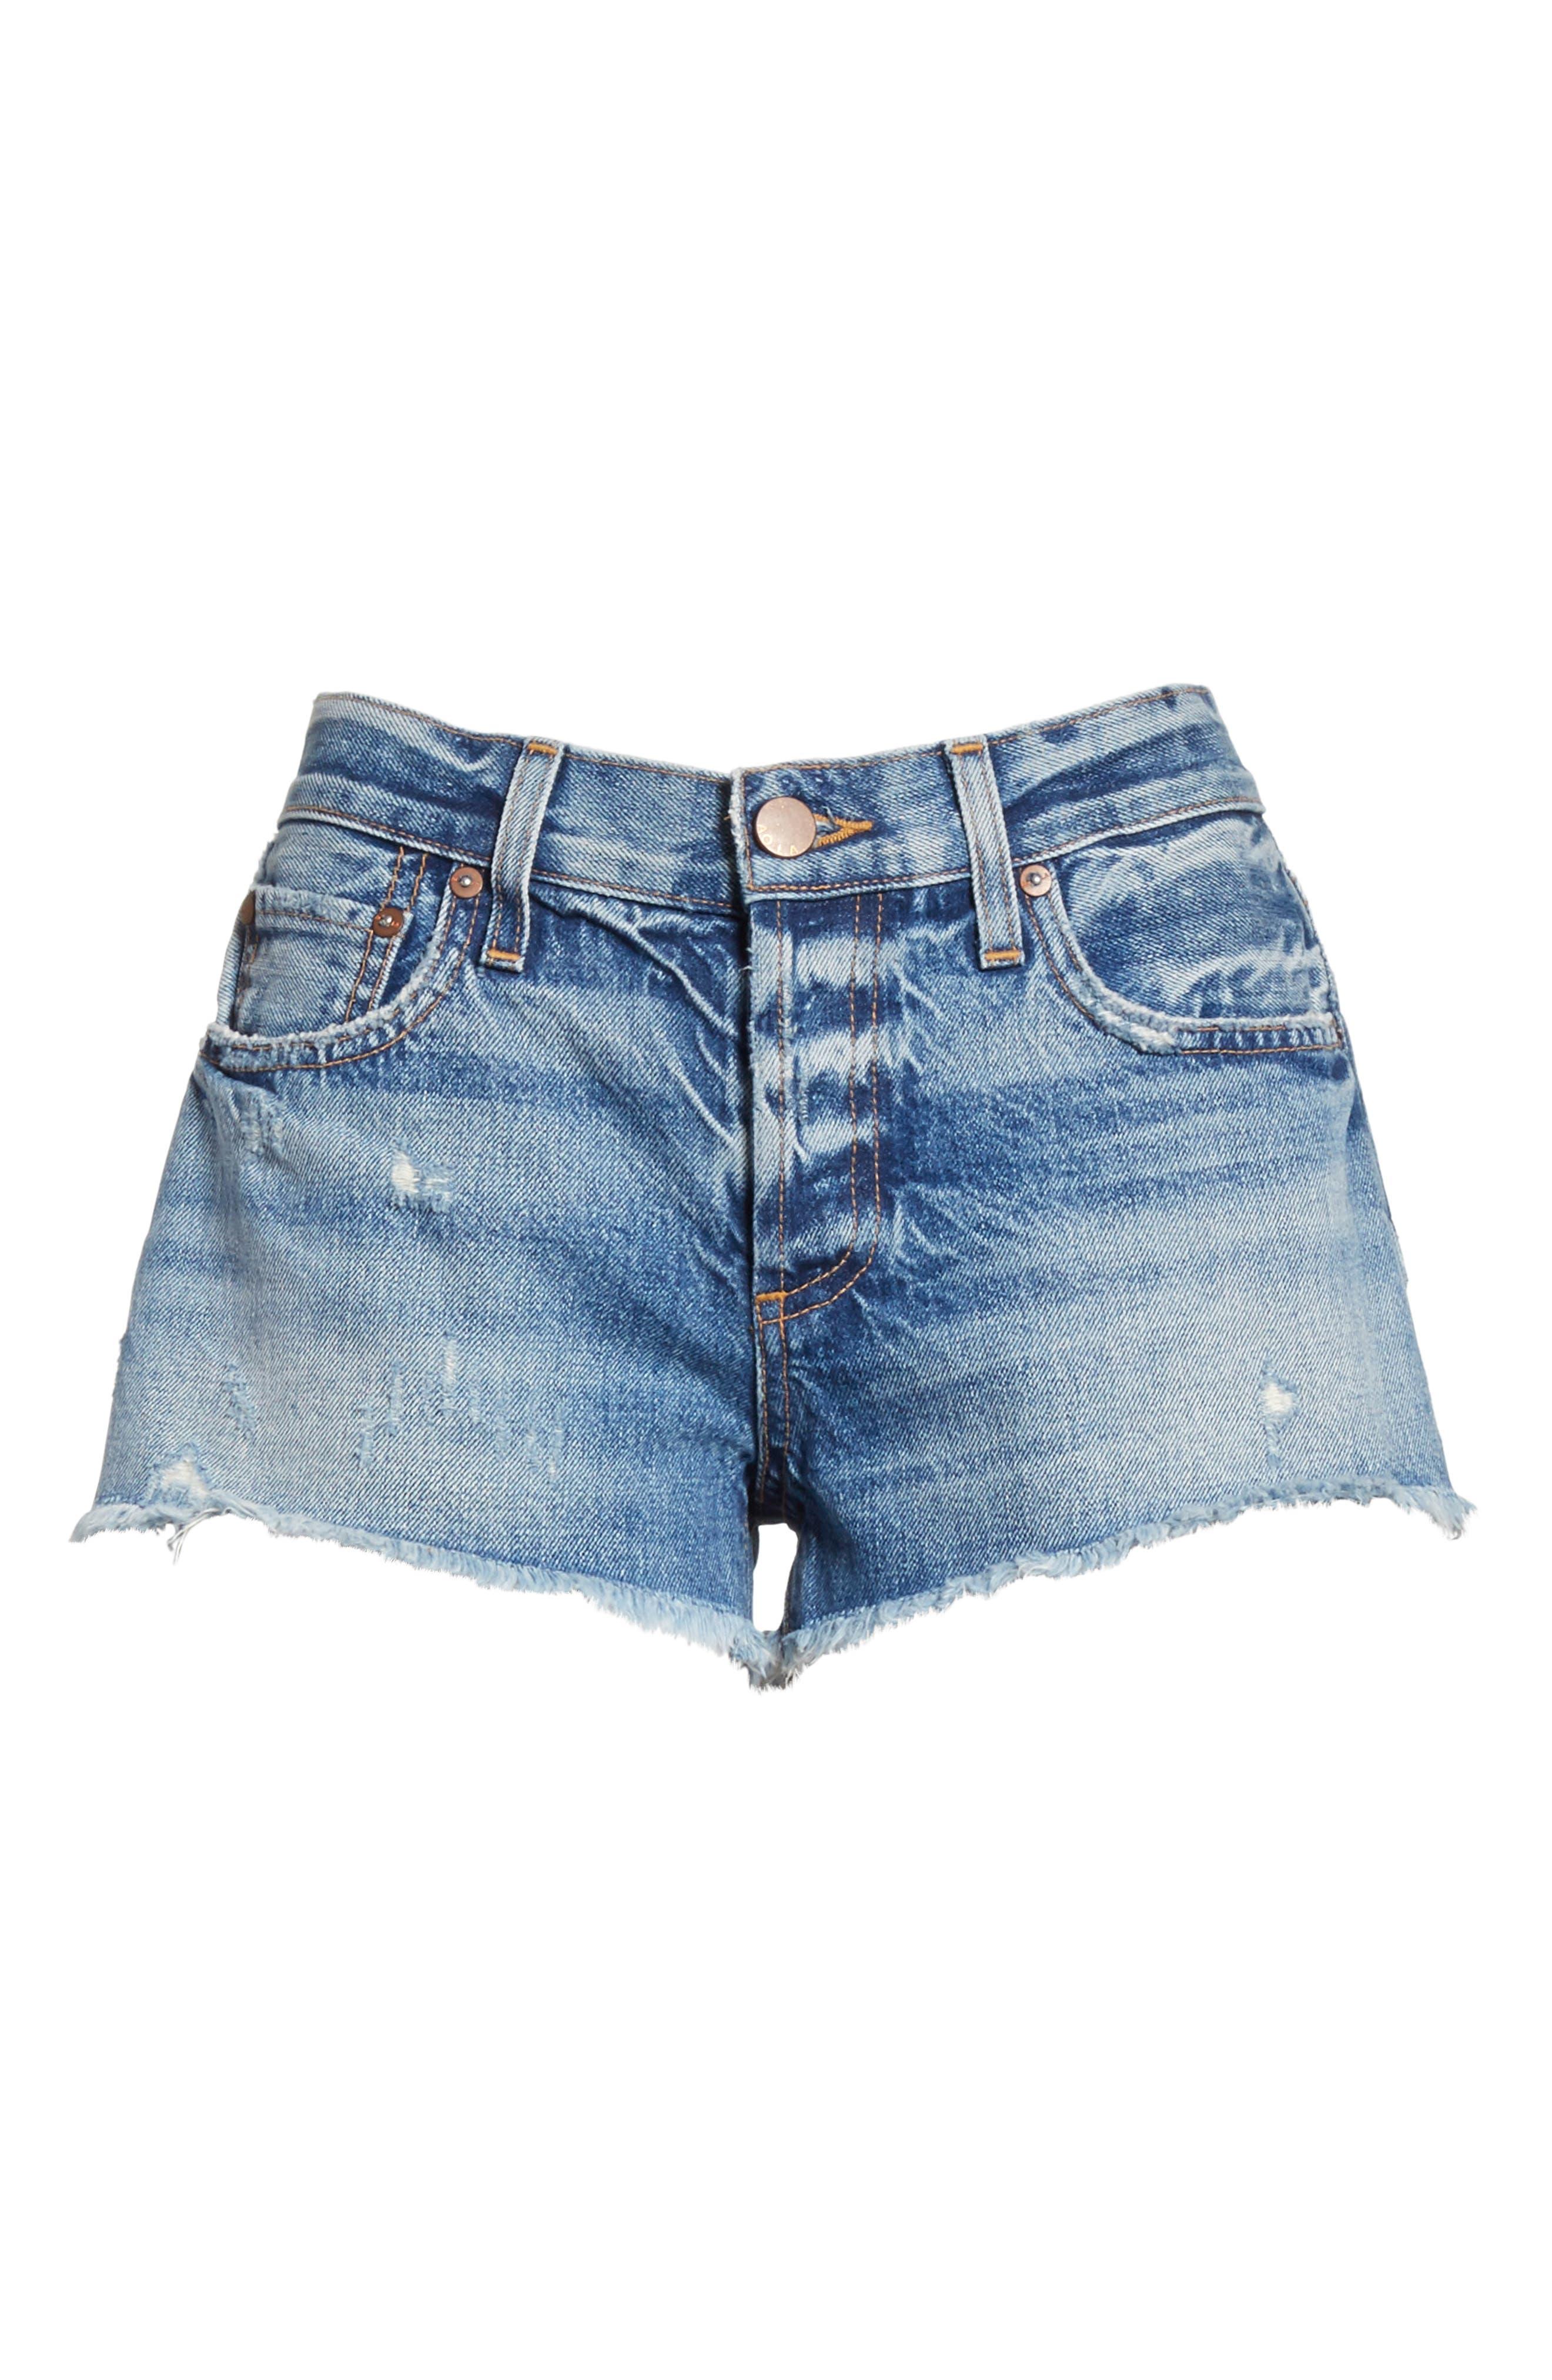 AO.LA Amazing Vintage Denim Shorts,                             Alternate thumbnail 6, color,                             415